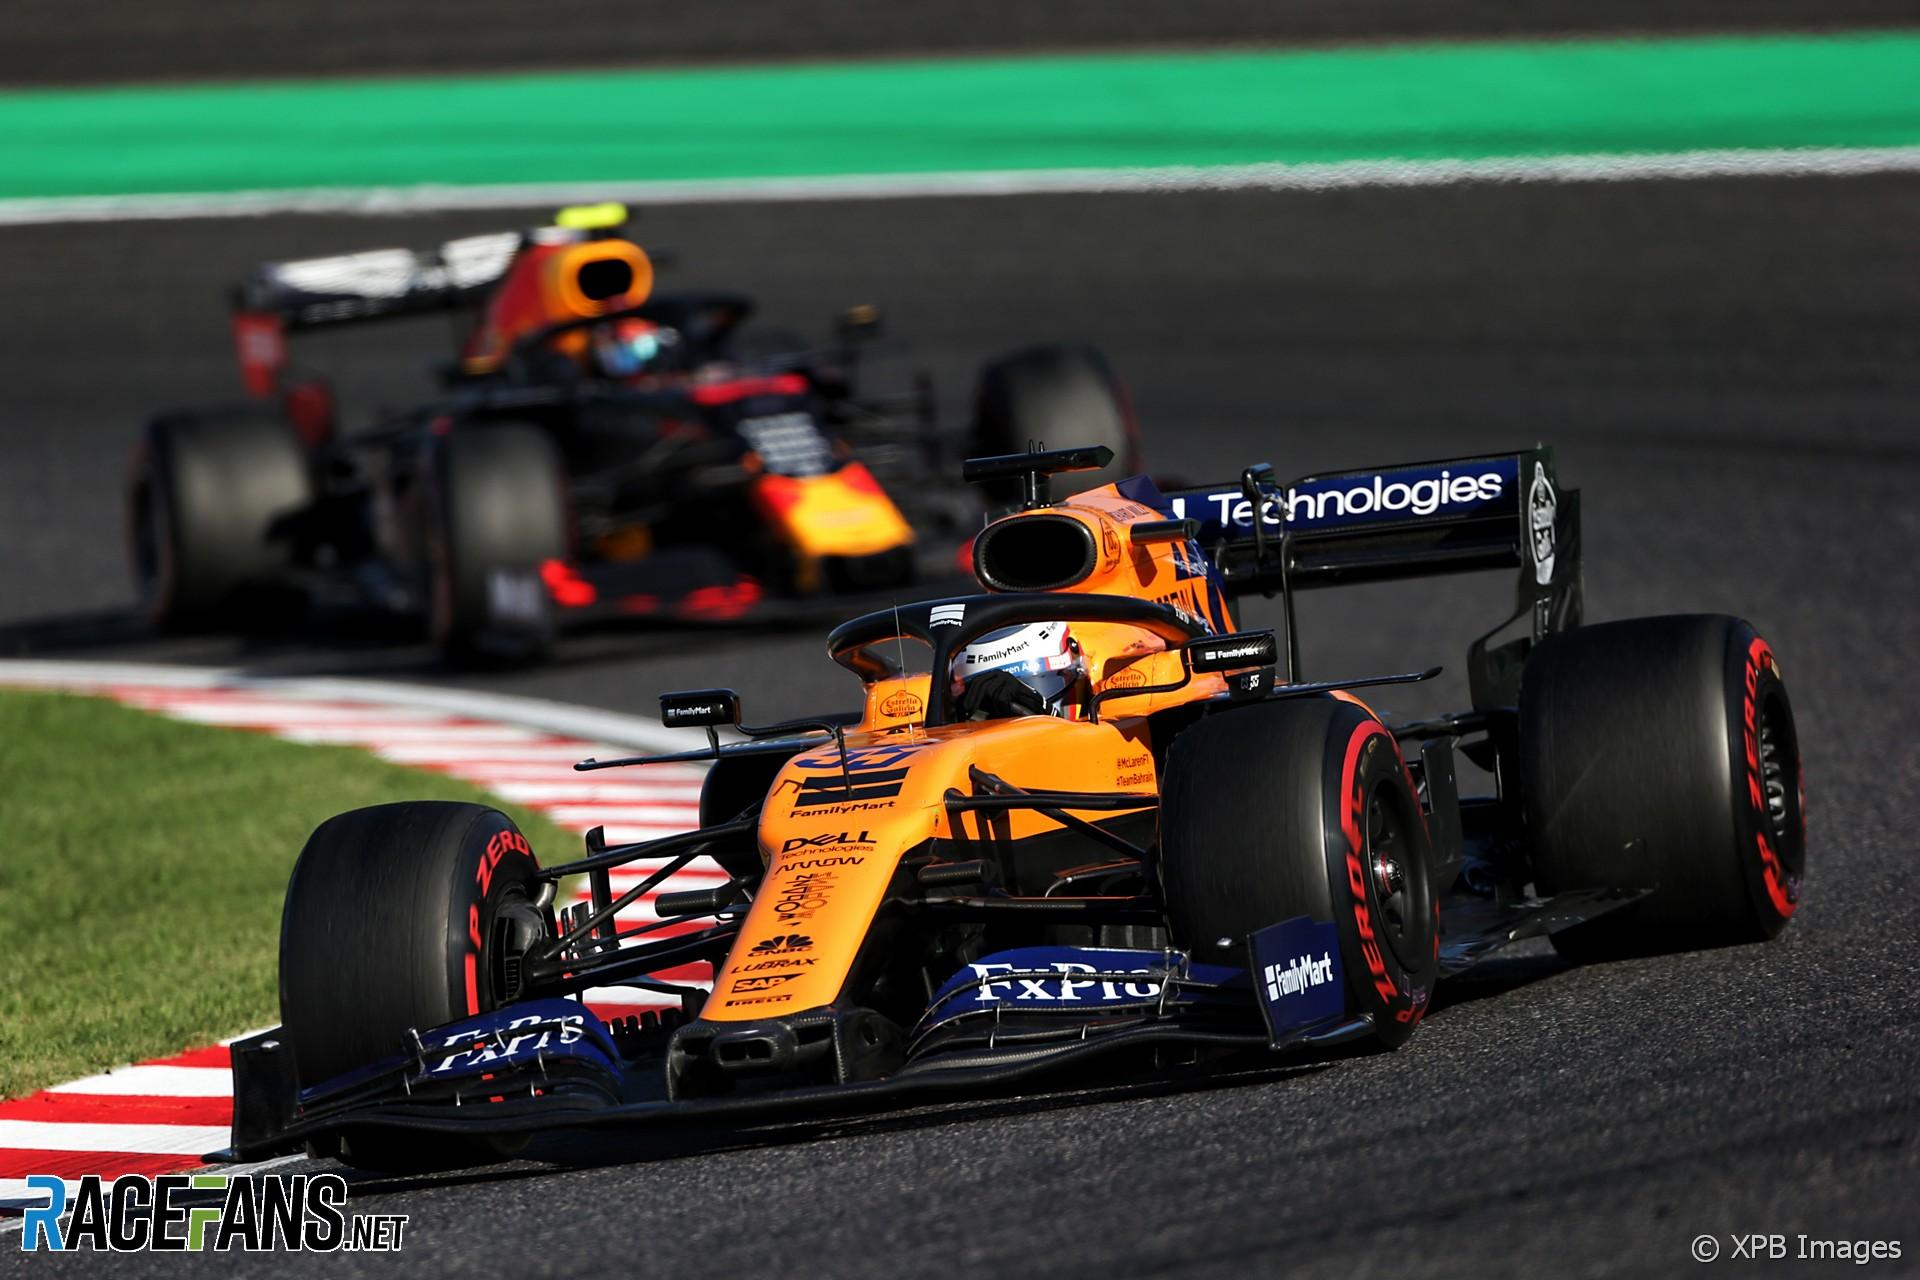 Carlos Sainz Jnr, McLaren, Suzuka, 2019